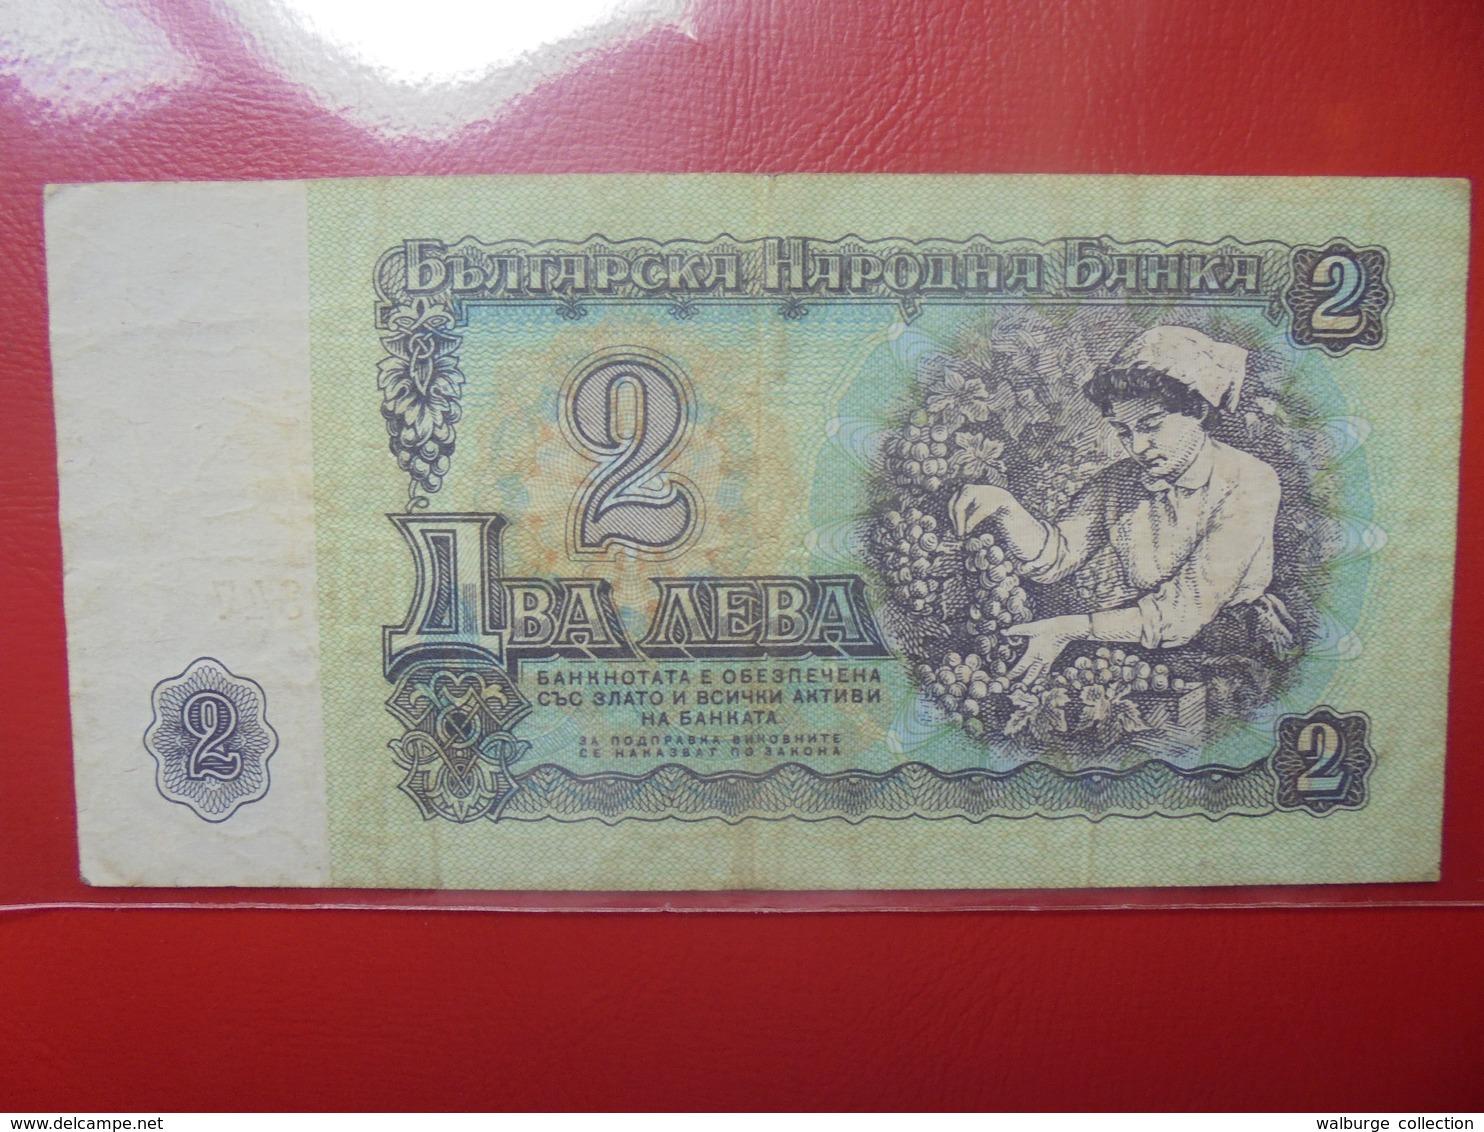 BULGARIE 2 LEVA 1974 CIRCULER (B.4) - Bulgaria